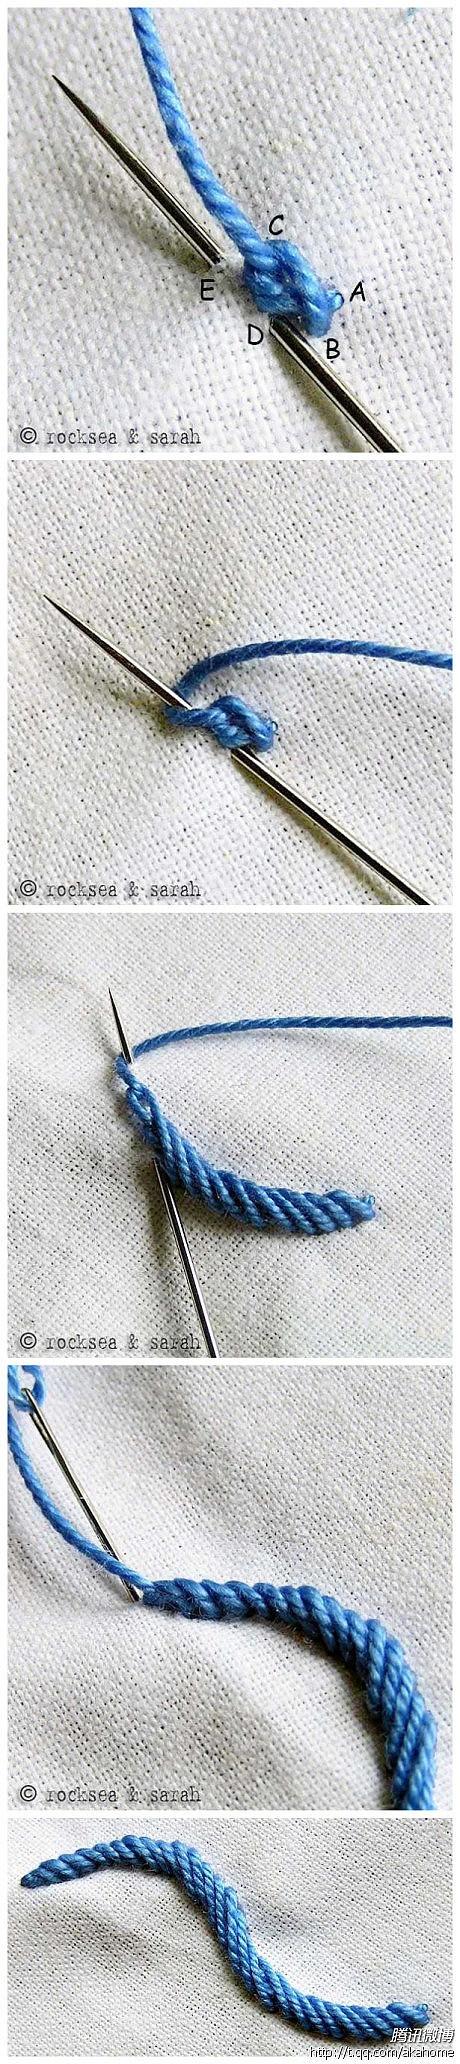 great stitch